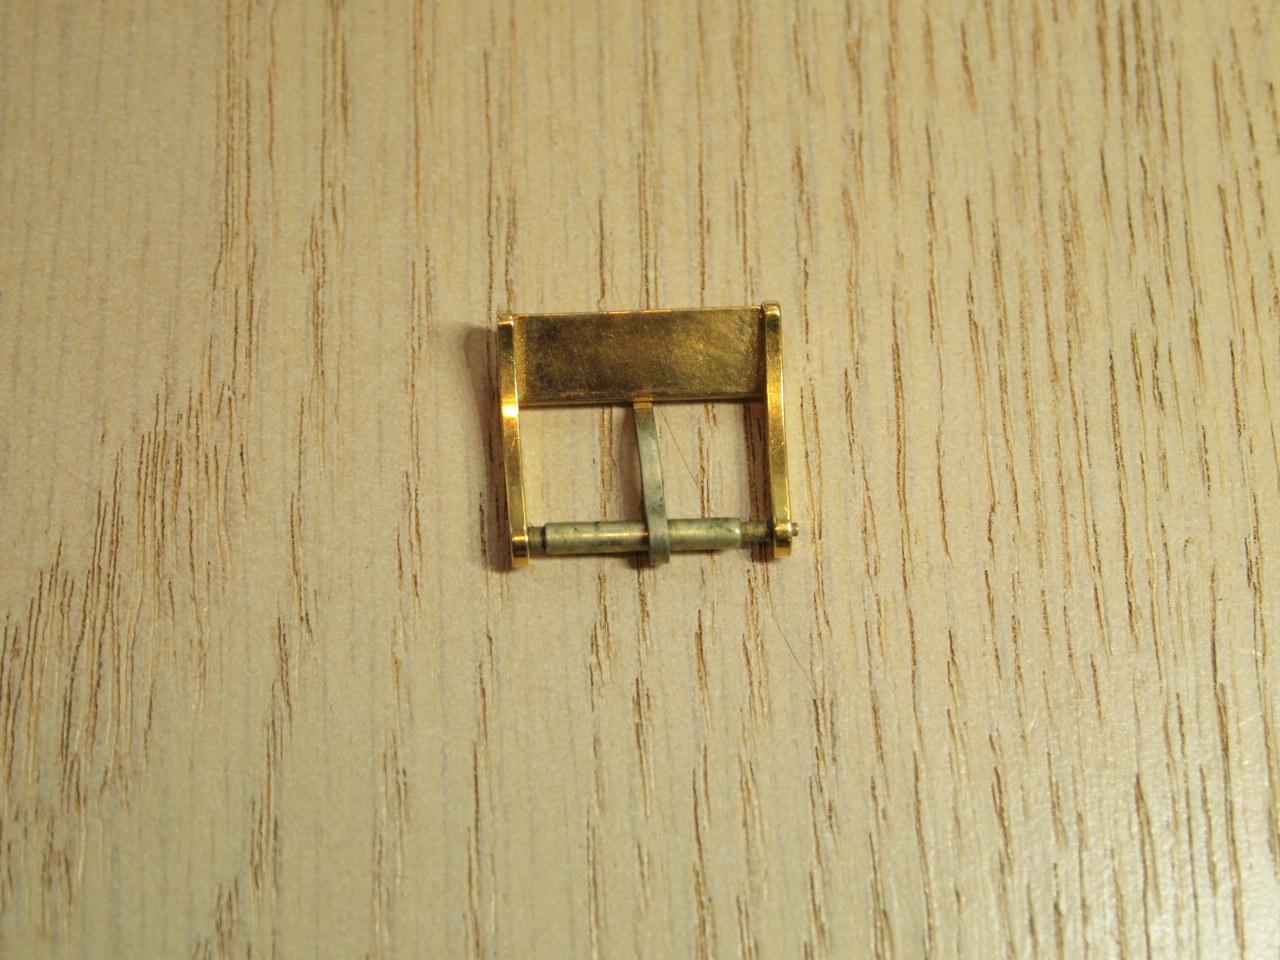 14 millimeters of LONGINES buckles